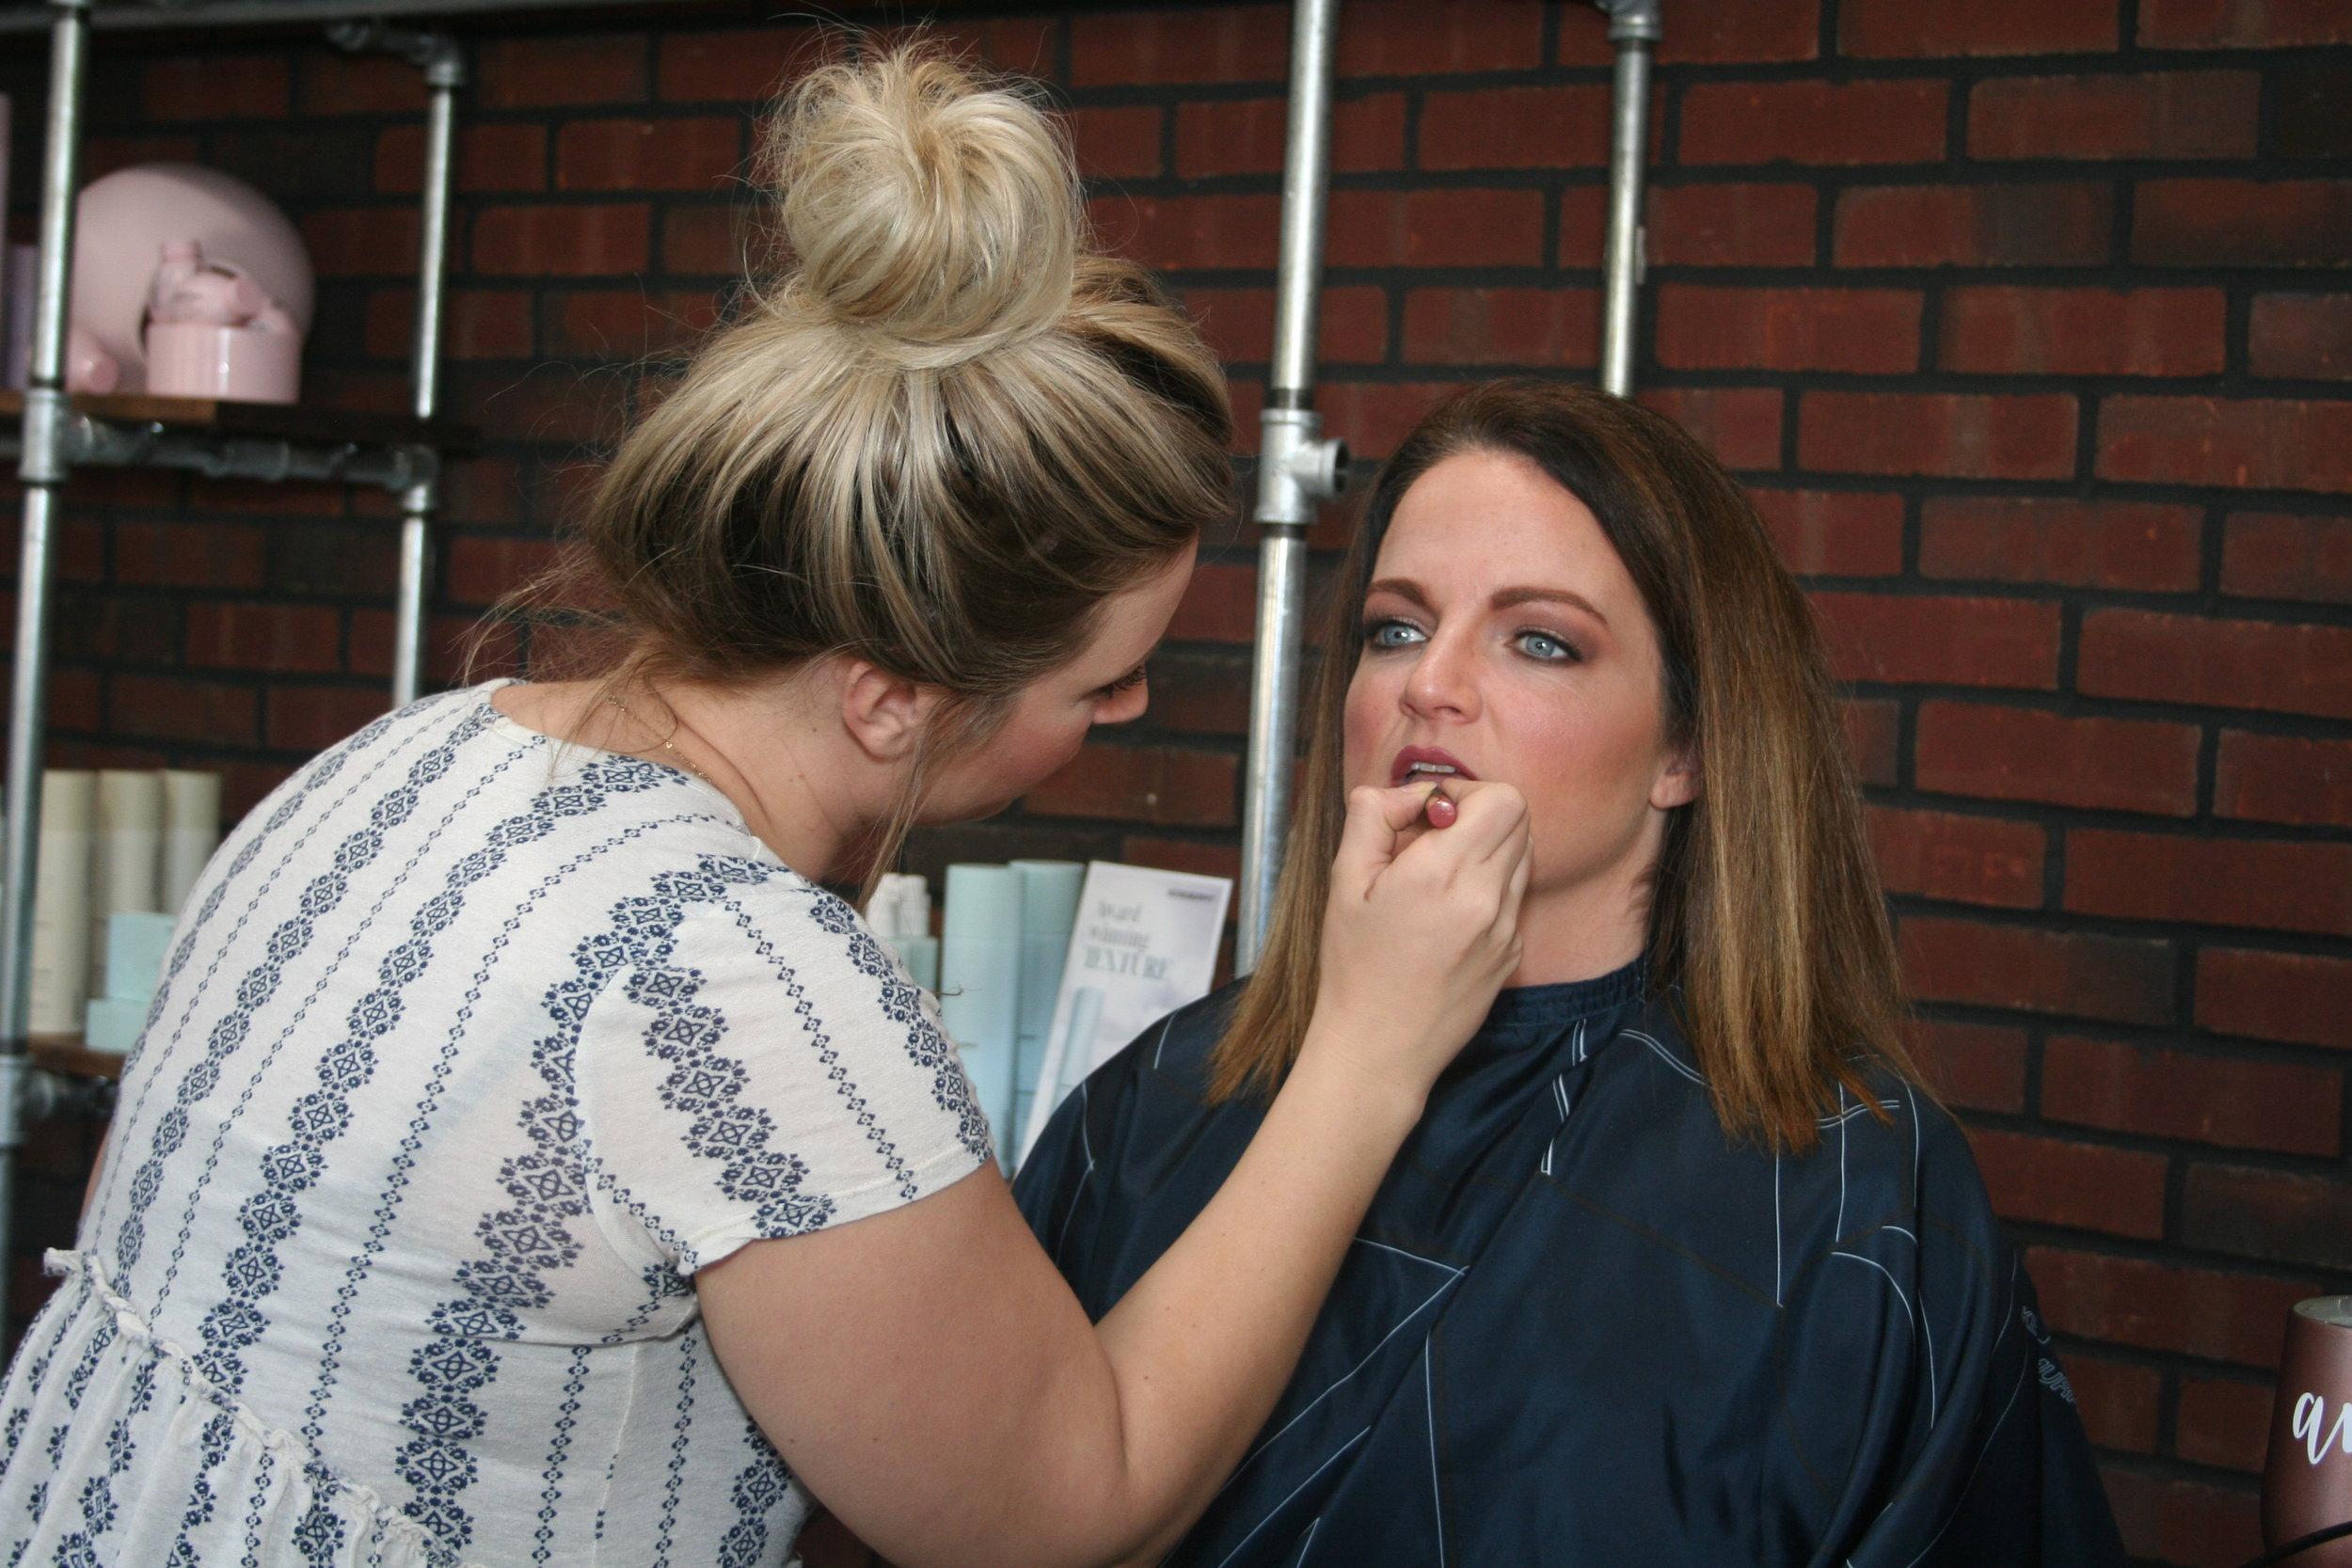 michelle doing makeup.JPG